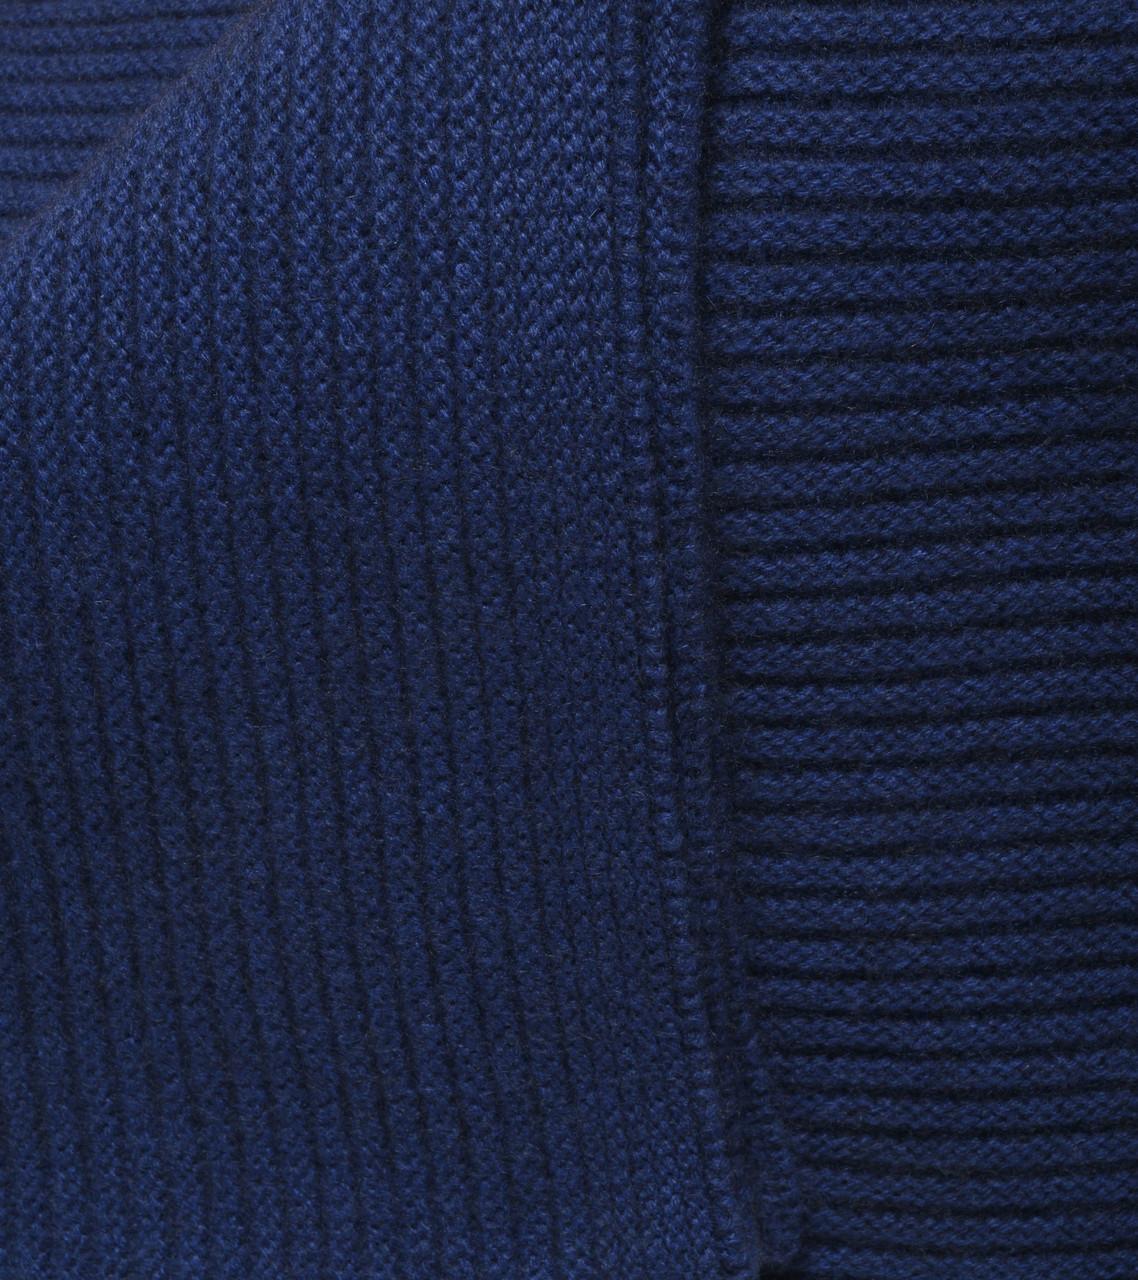 Cobalt Blue Ribbed Knit Cashmere Throw